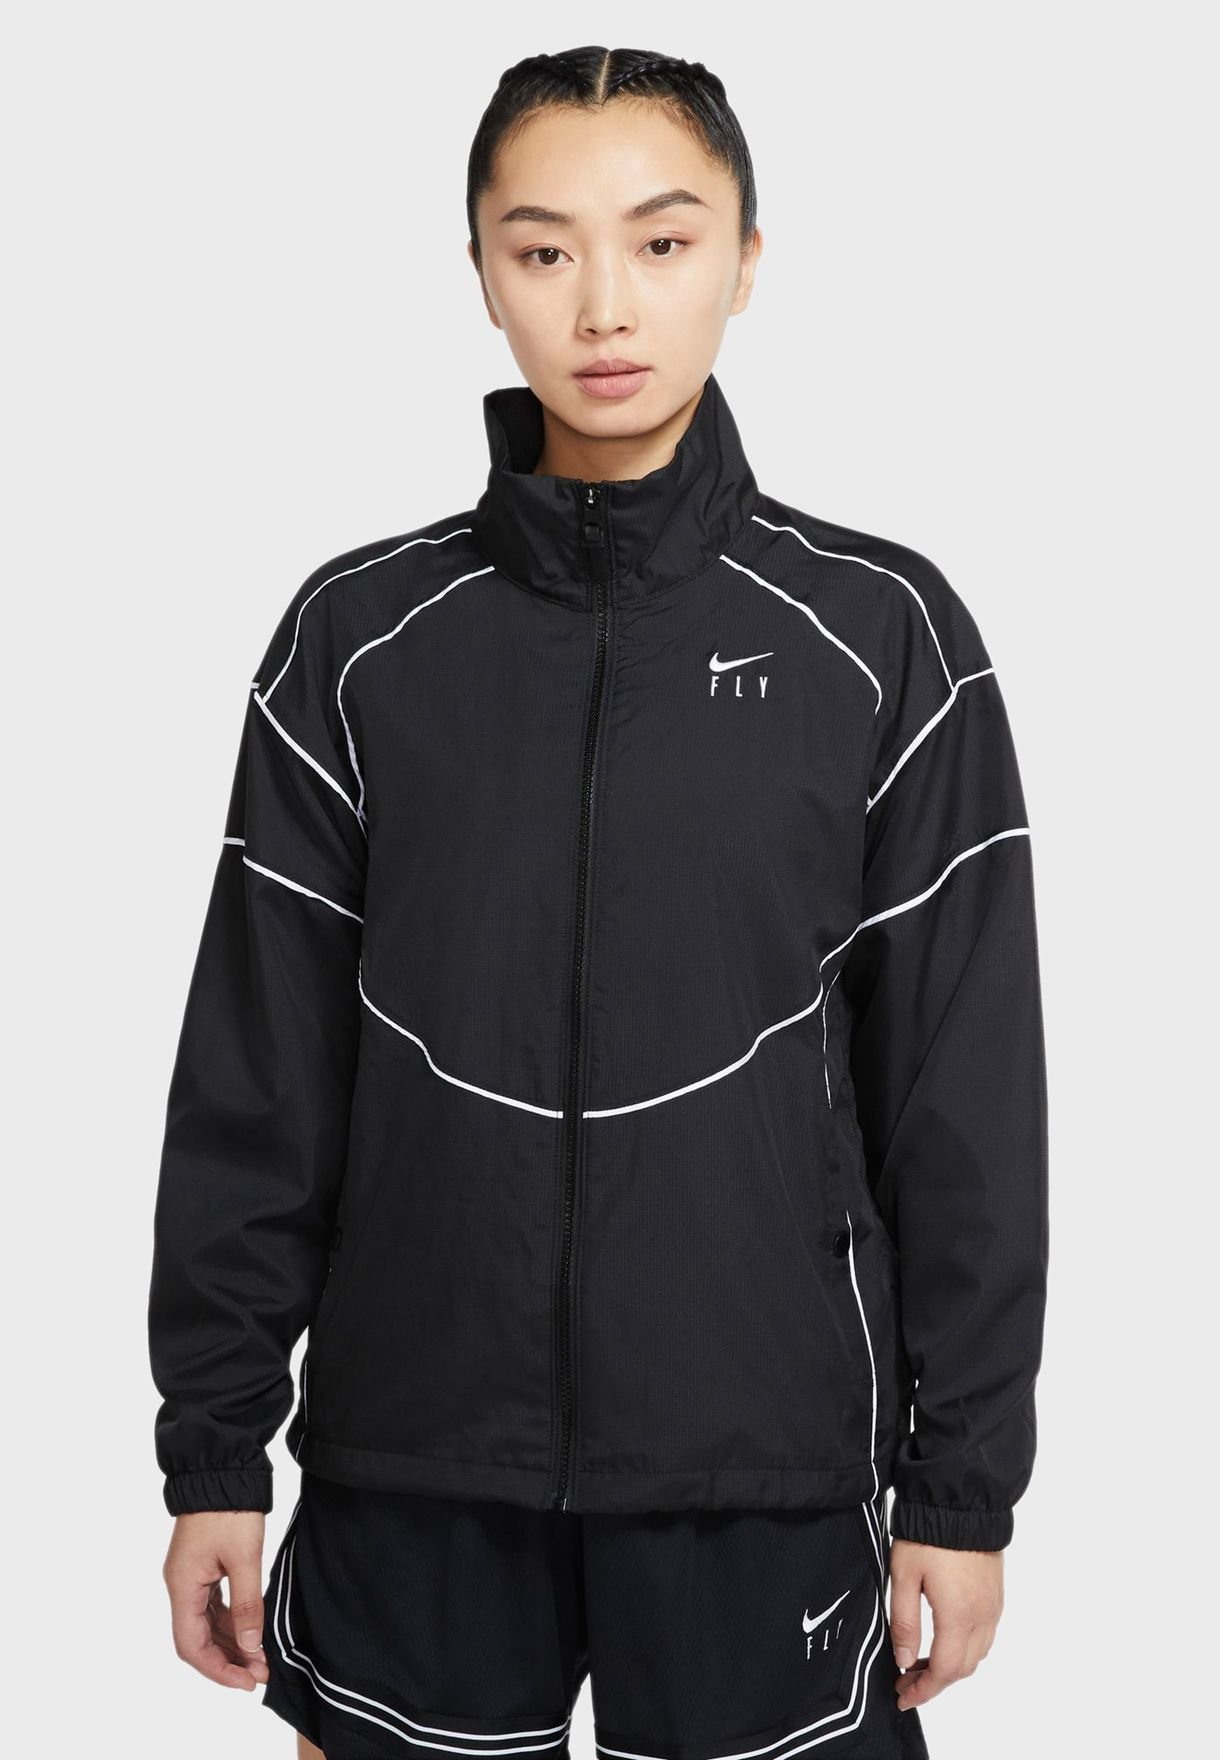 Swoosh Fly Jacket